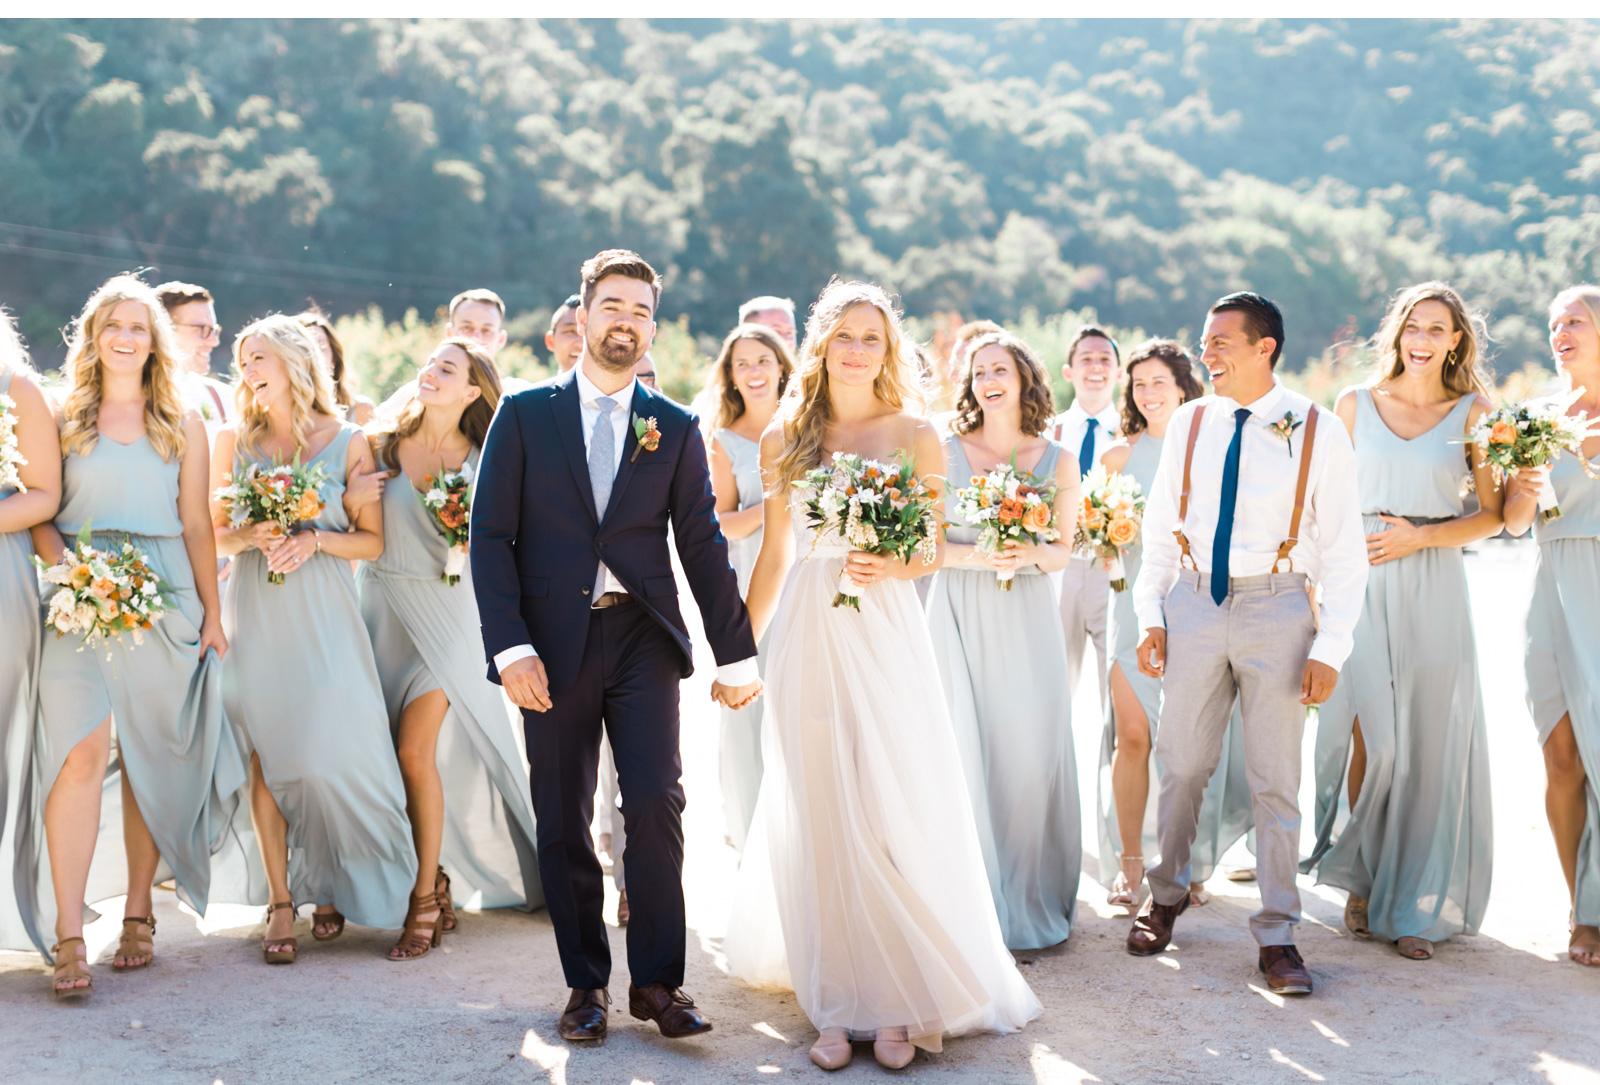 Style-Me-Pretty-San-Luis-Obispo-Wedding-Natalie-Schutt-Photography_14.jpg